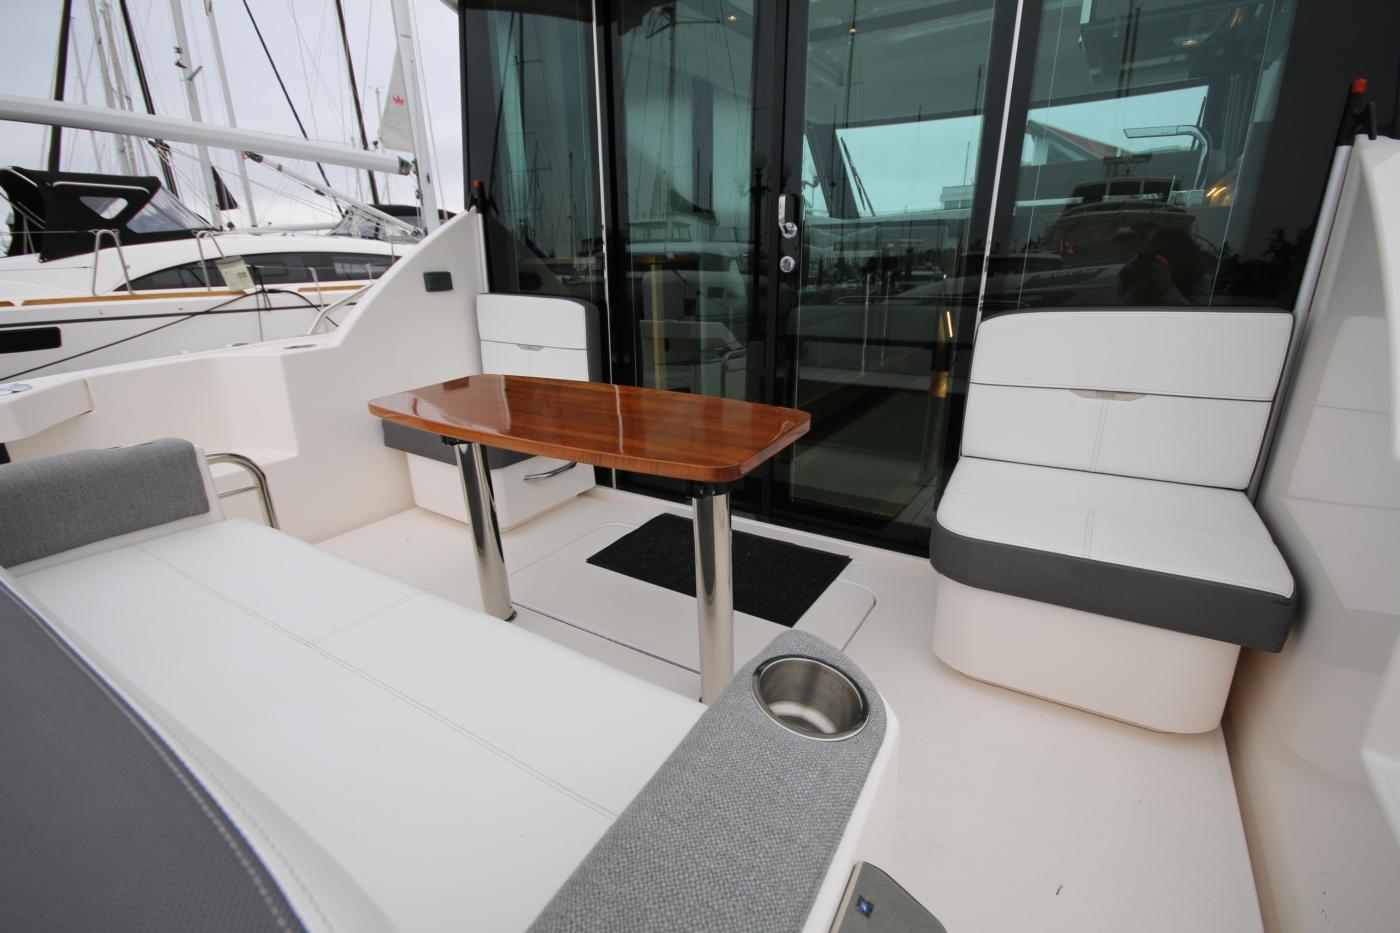 2018 Tiara Yachts 39 Coupe, Cockpit